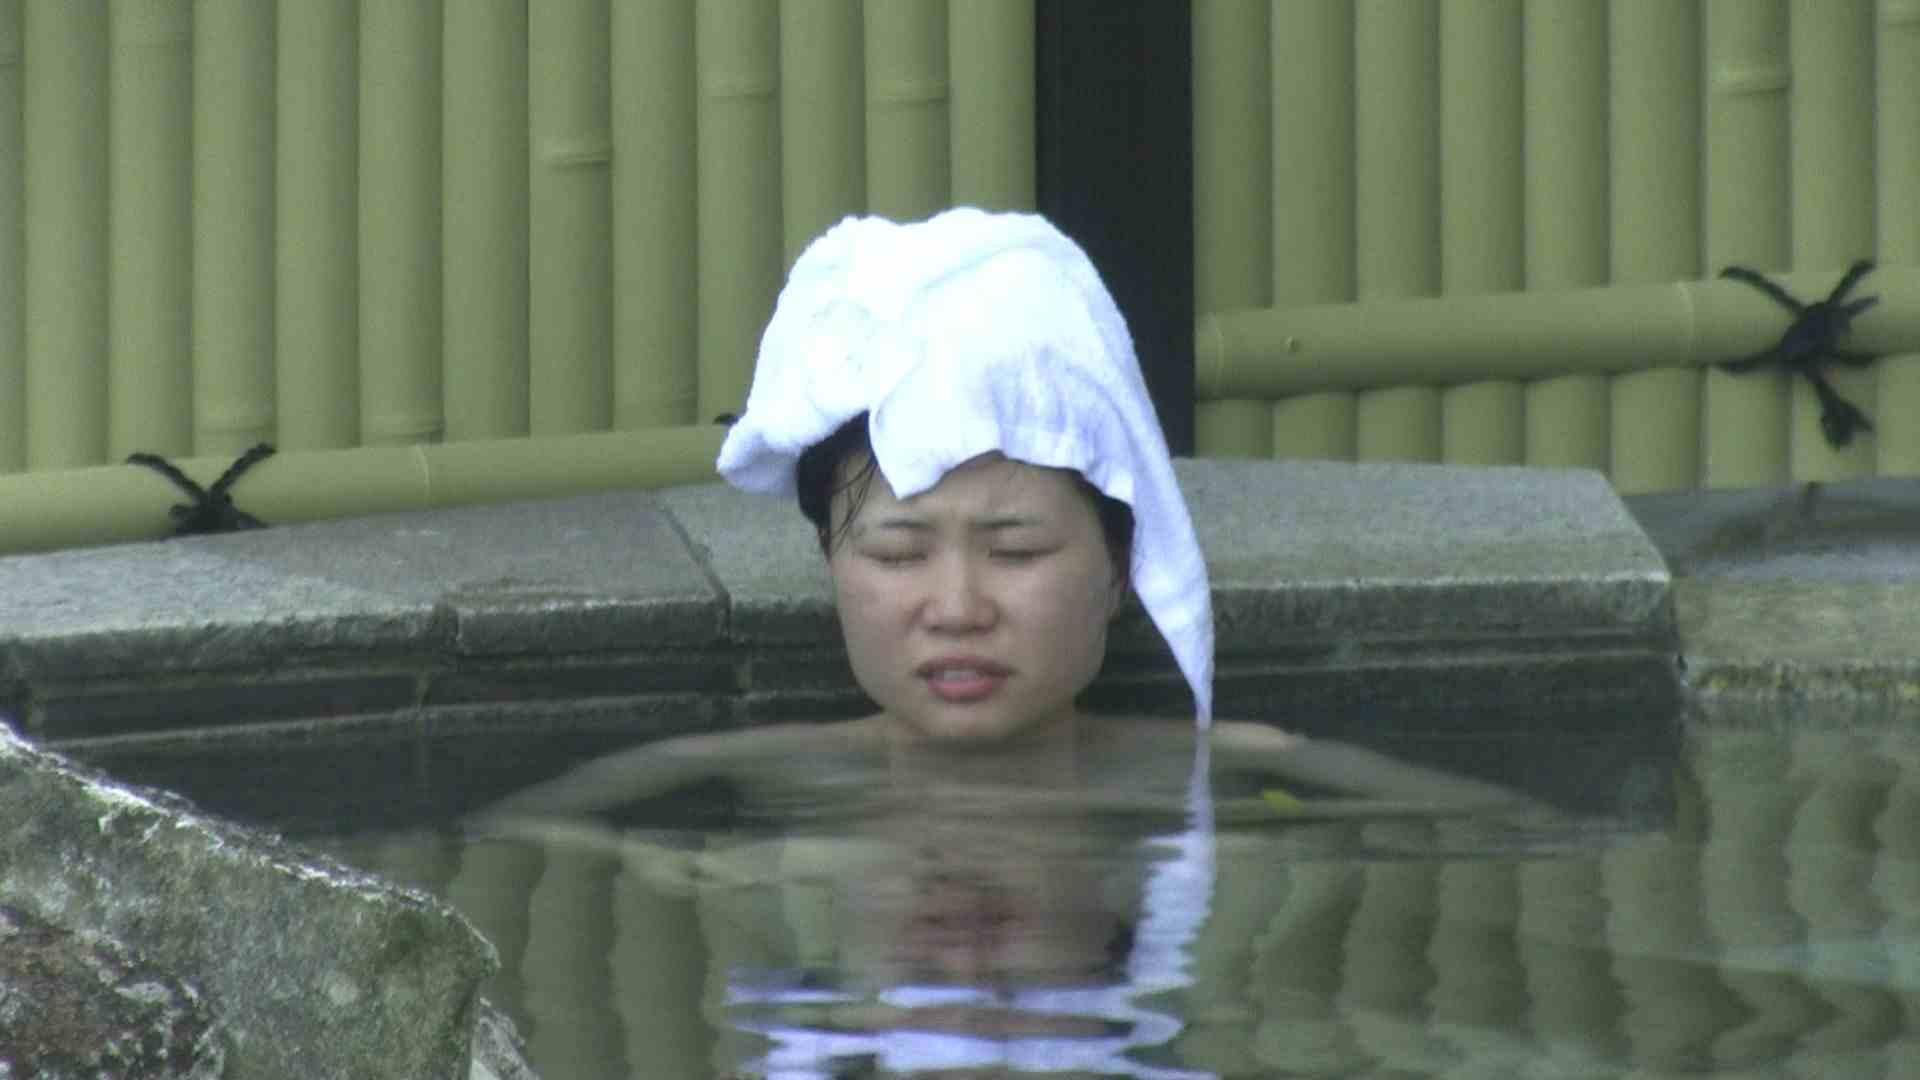 Aquaな露天風呂Vol.183 露天風呂編  104PIX 16